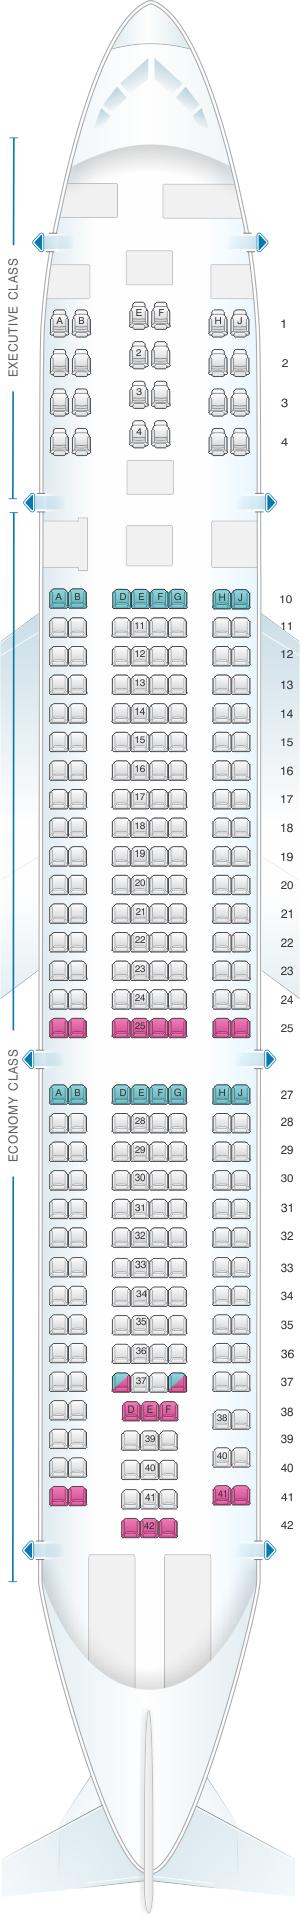 Seat Map Tap Portugal Airbus A330 Seatmaestro Com